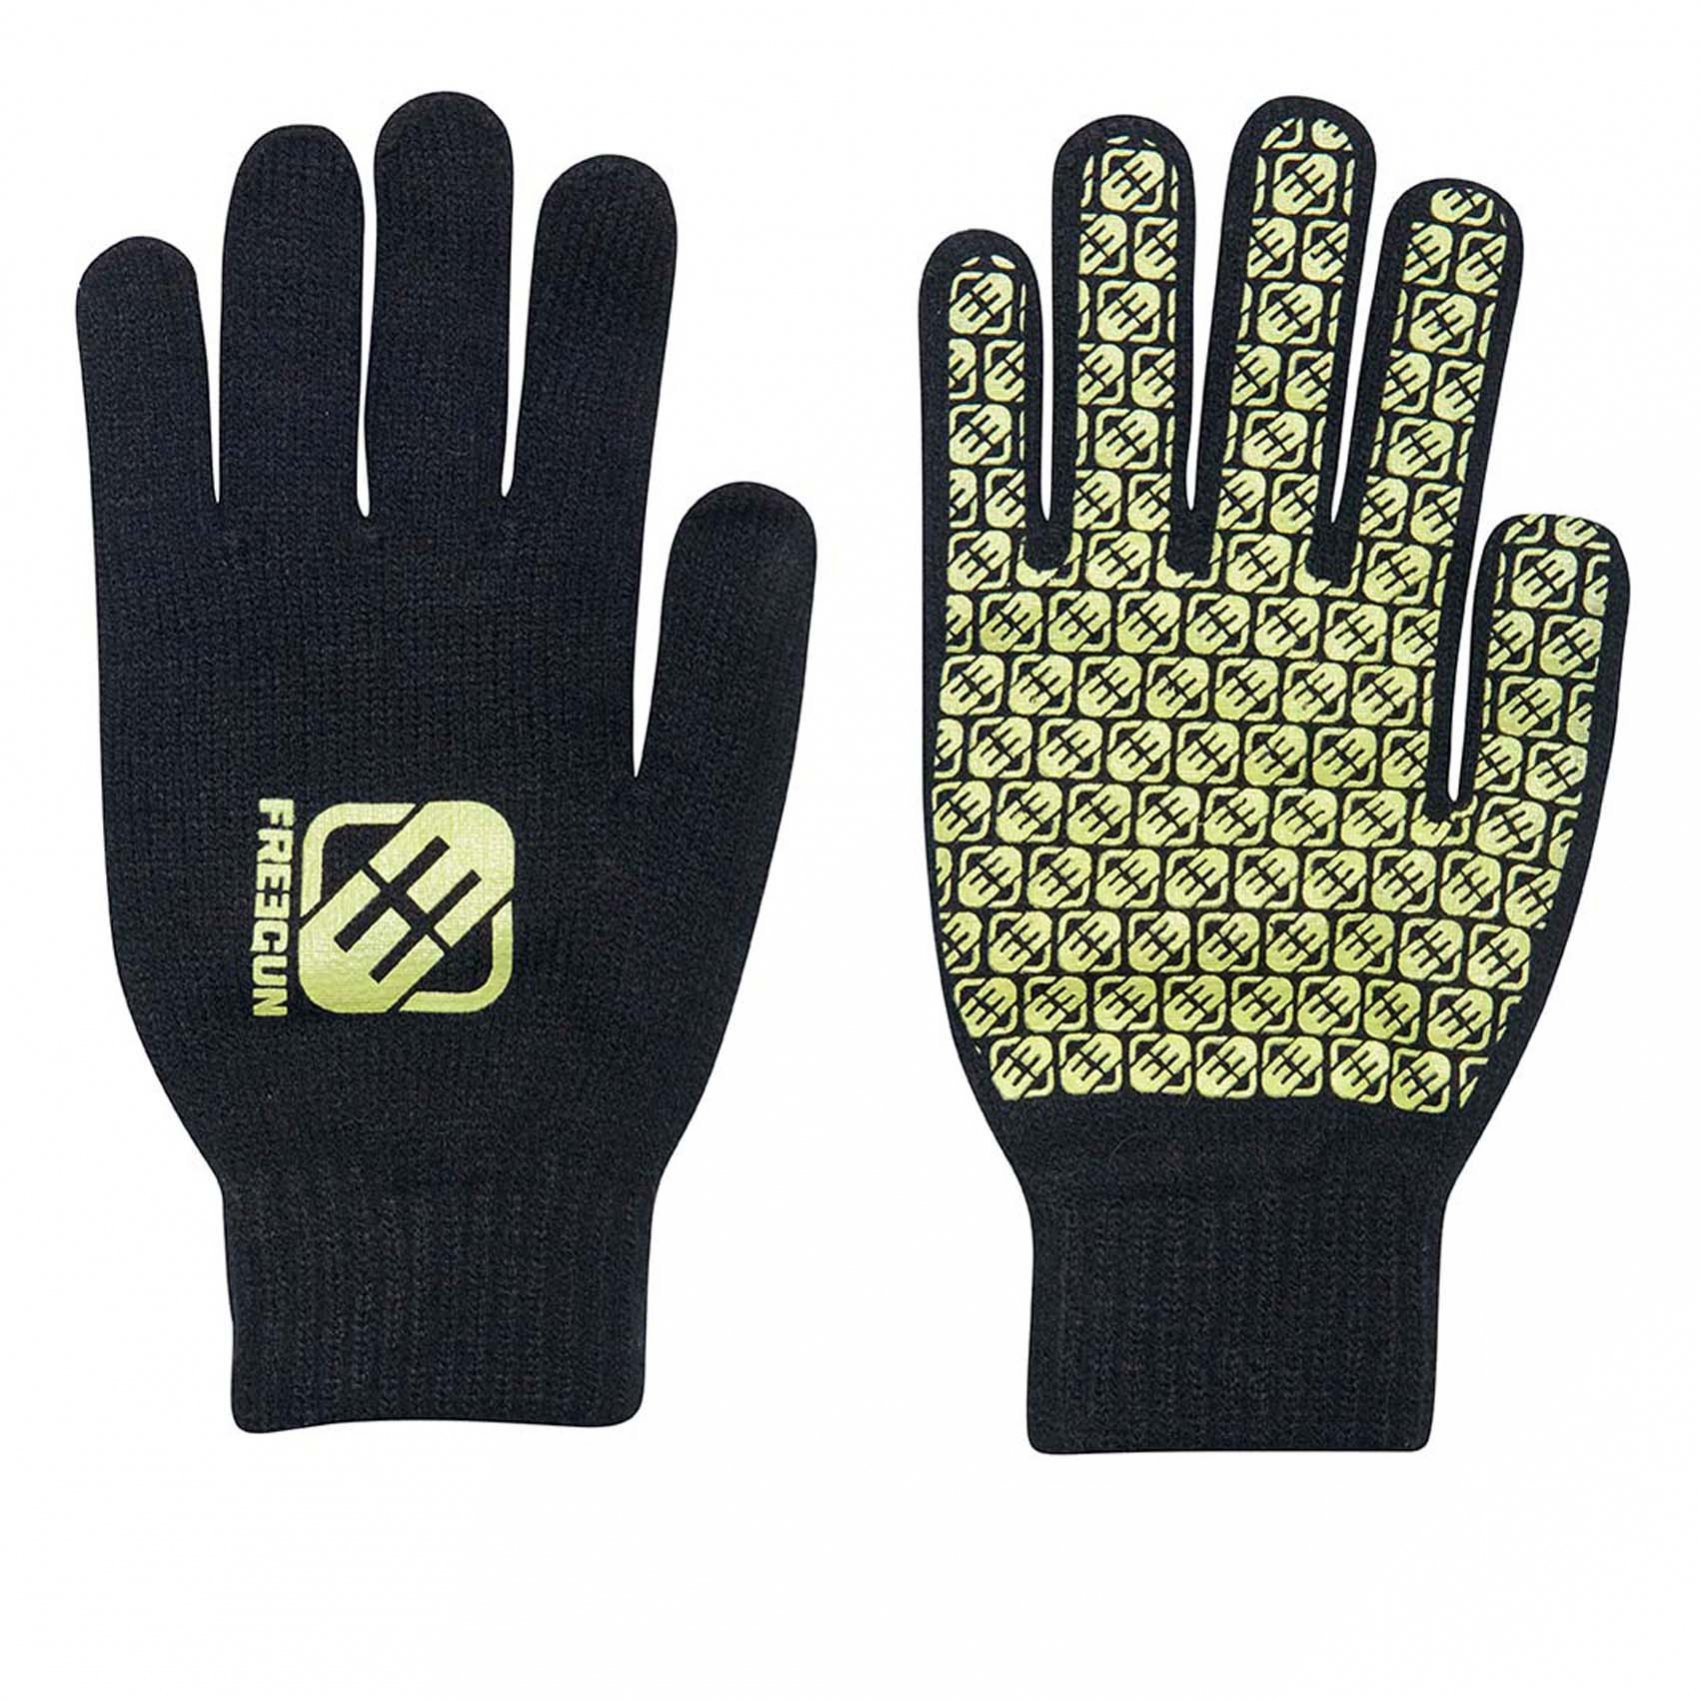 Paire de gants garçon logo jaune freegun (photo)